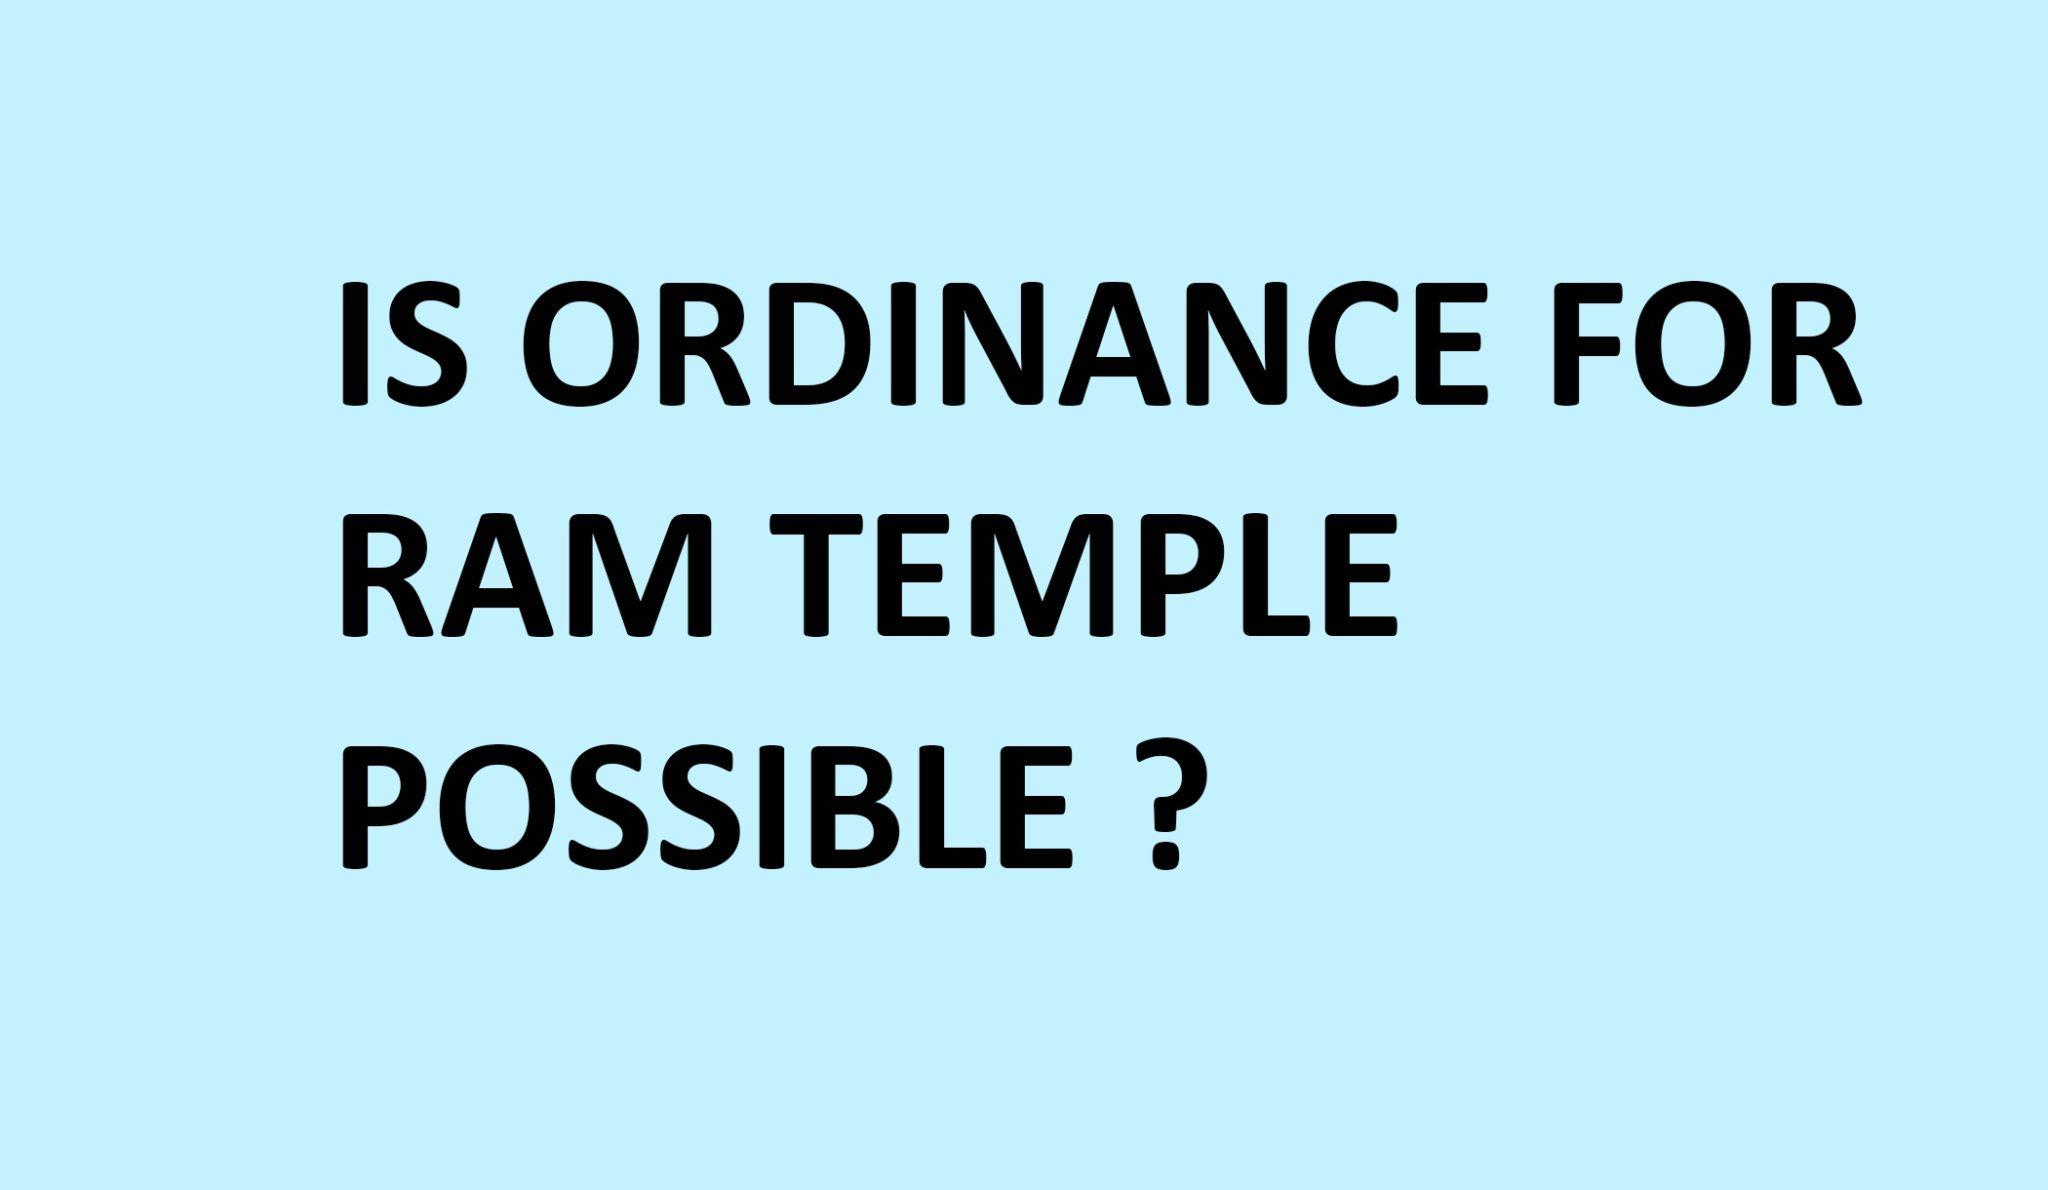 ordinance for ram temple